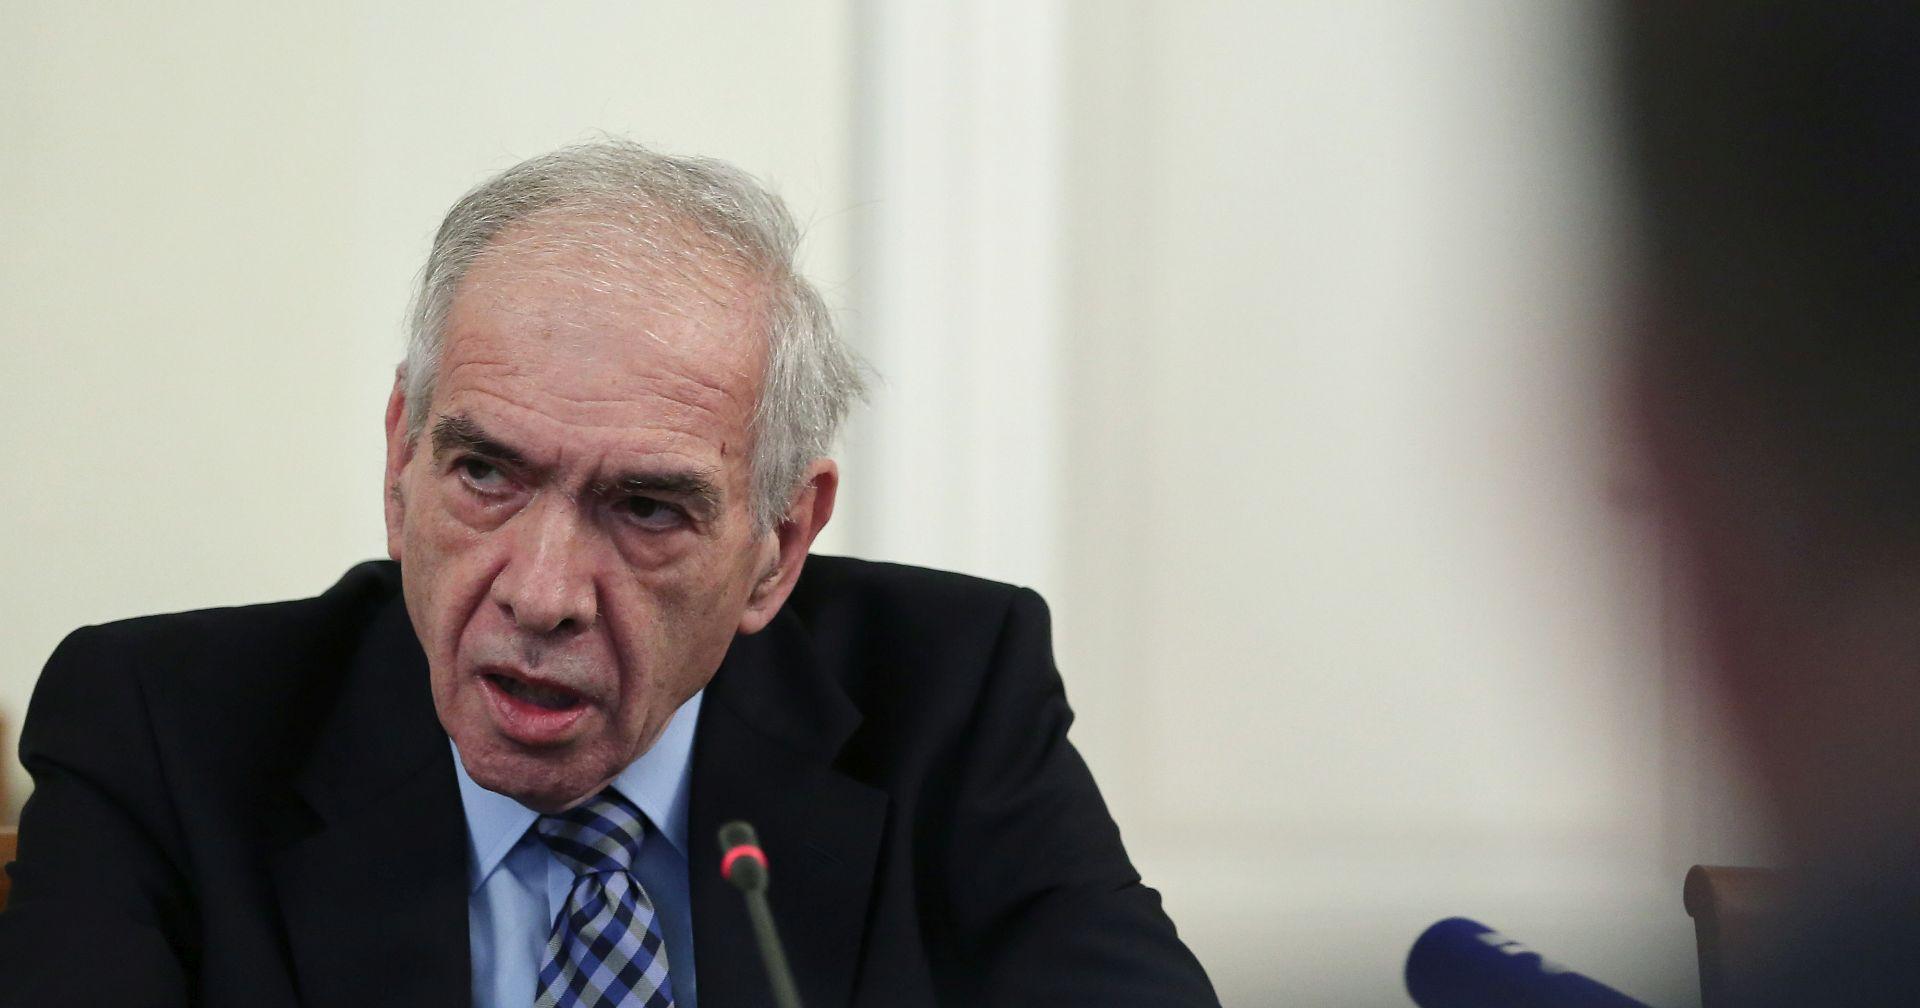 Preminuo bivši guverner HNB-a Željko Rohatinski